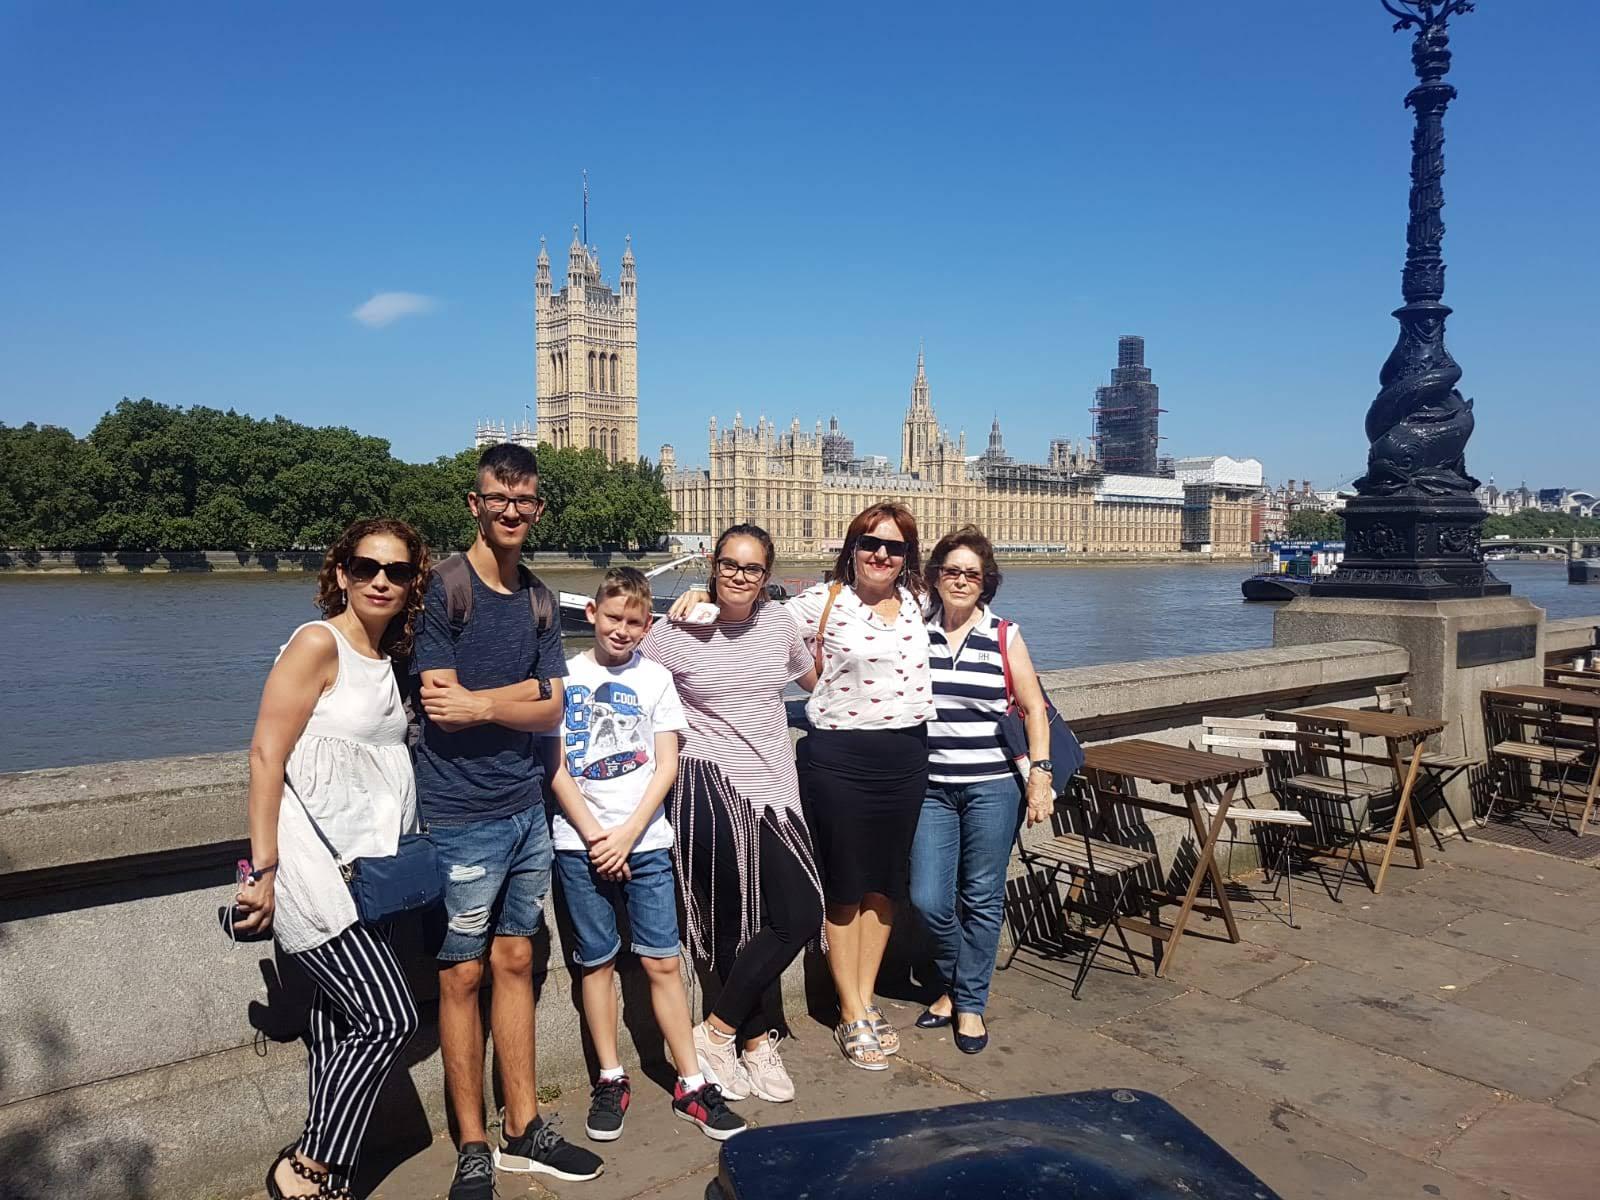 Family Photo  on Harry Potter  taxi tour, Embankment